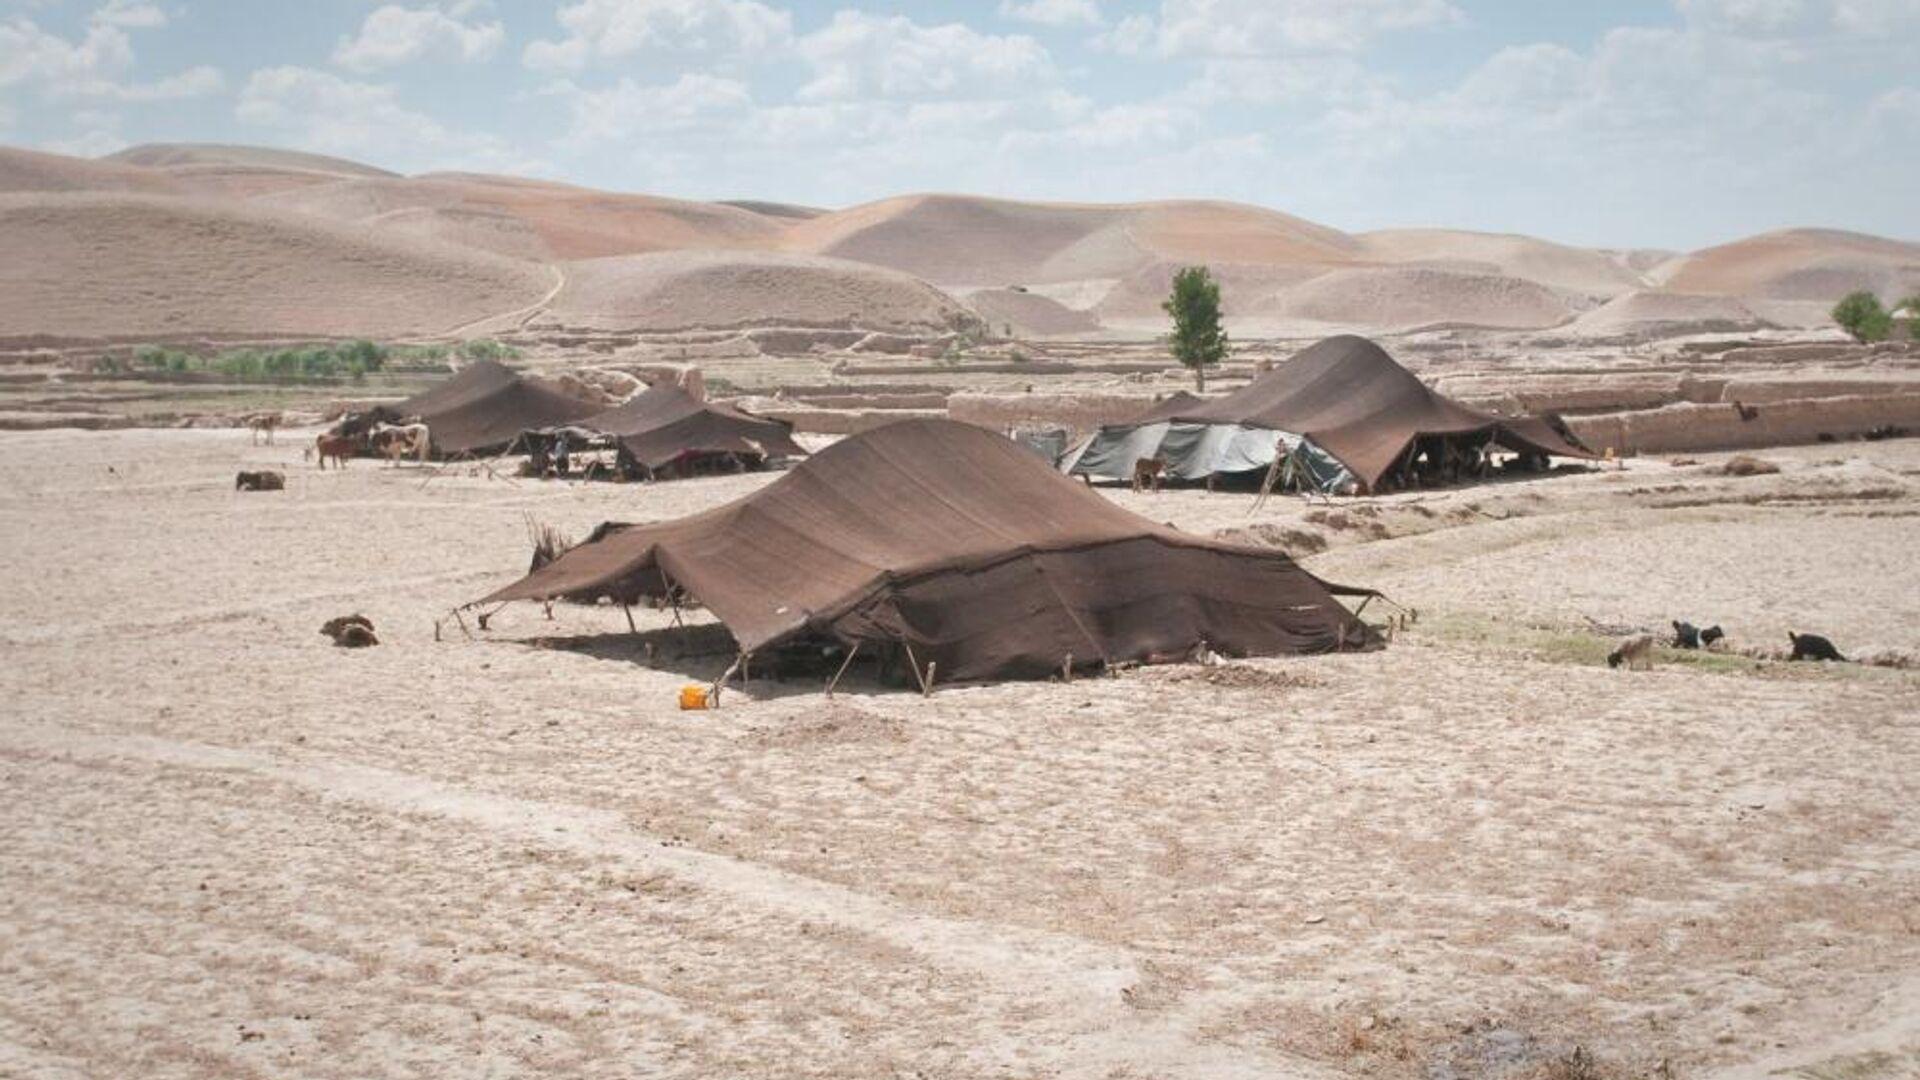 Provinz Badghis, Afghanistan (Archivbild) - SNA, 1920, 07.07.2021